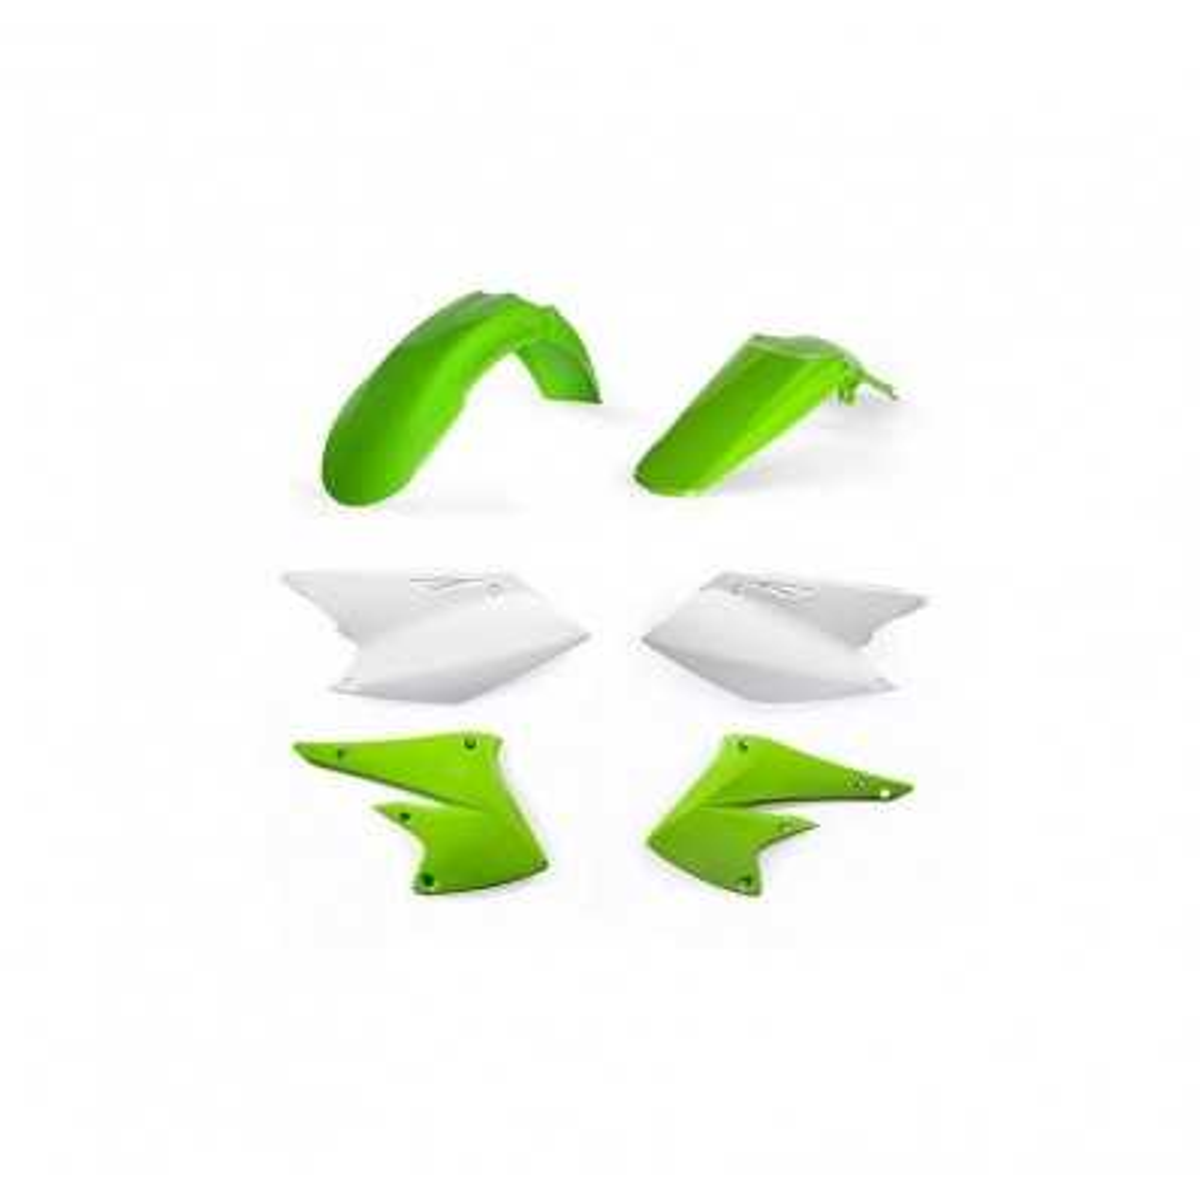 0022377-131 - Kit Plasticos Kxf 250 17 Blanco Verde